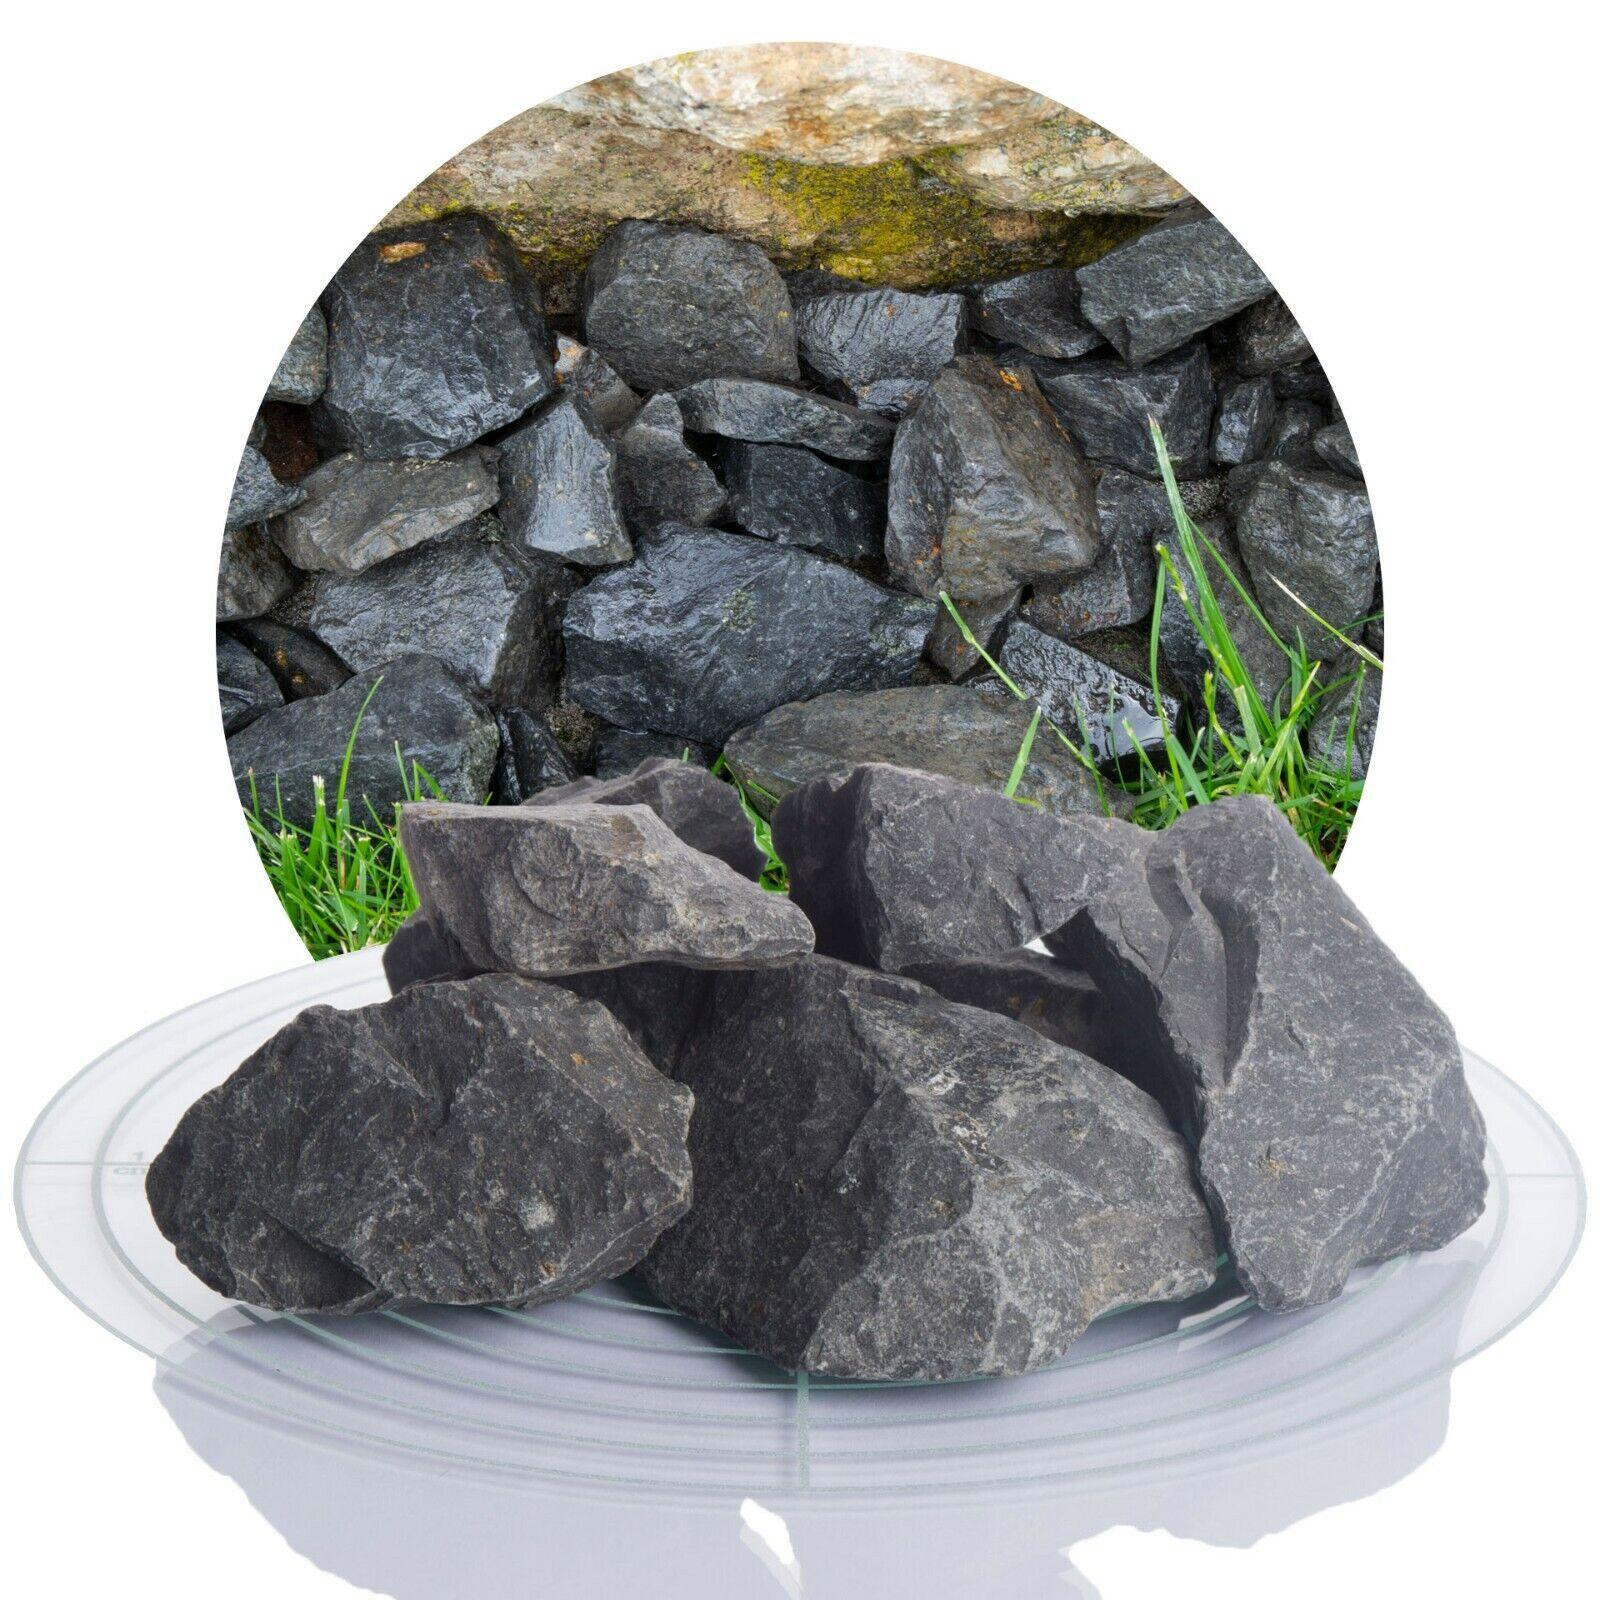 (0,24€/kg) 1 Tonne Basalt Zierkies Gartenkies anthrazit Ziersplitt 1000kg BigBag